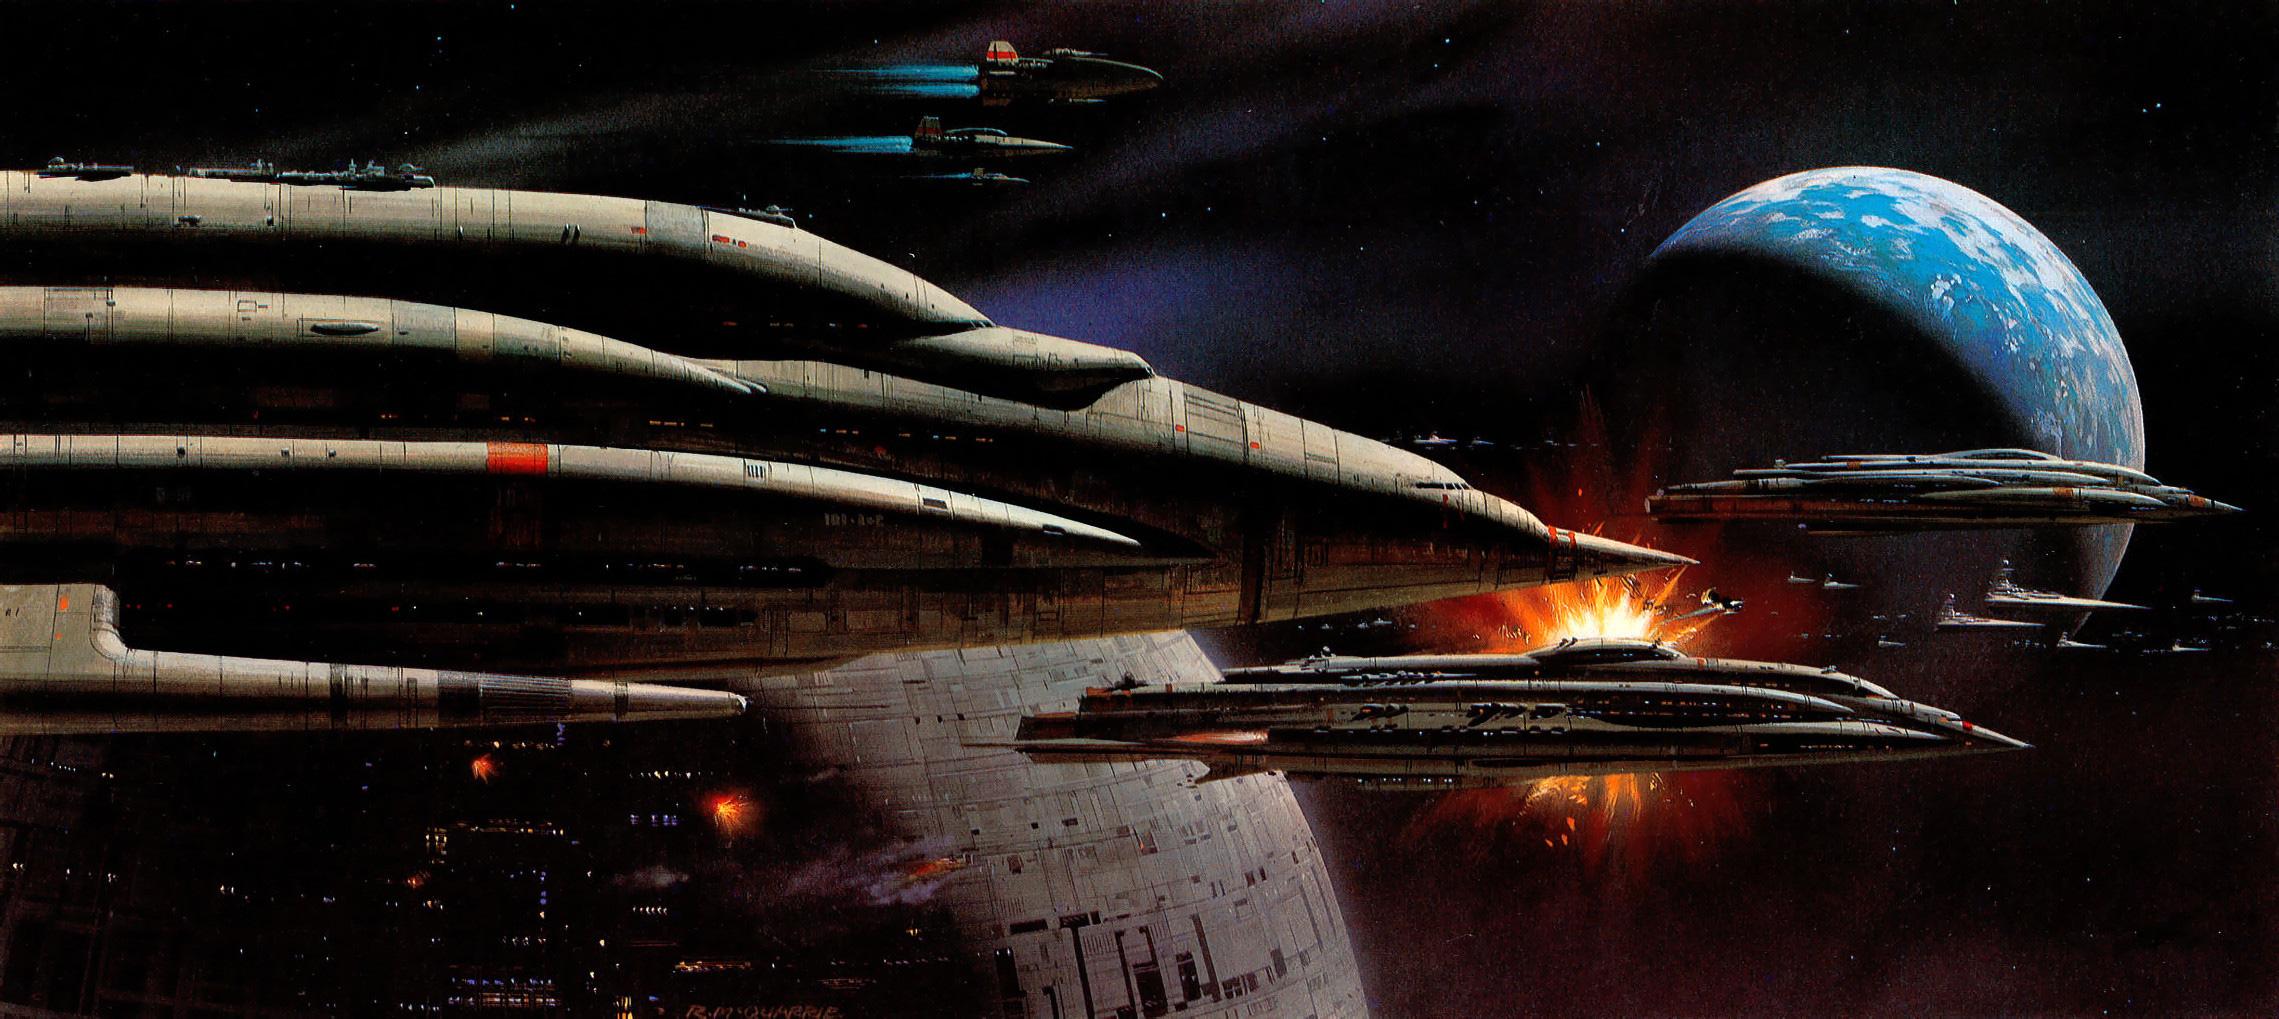 ralph-mcquarrie-star-wars-concept_077